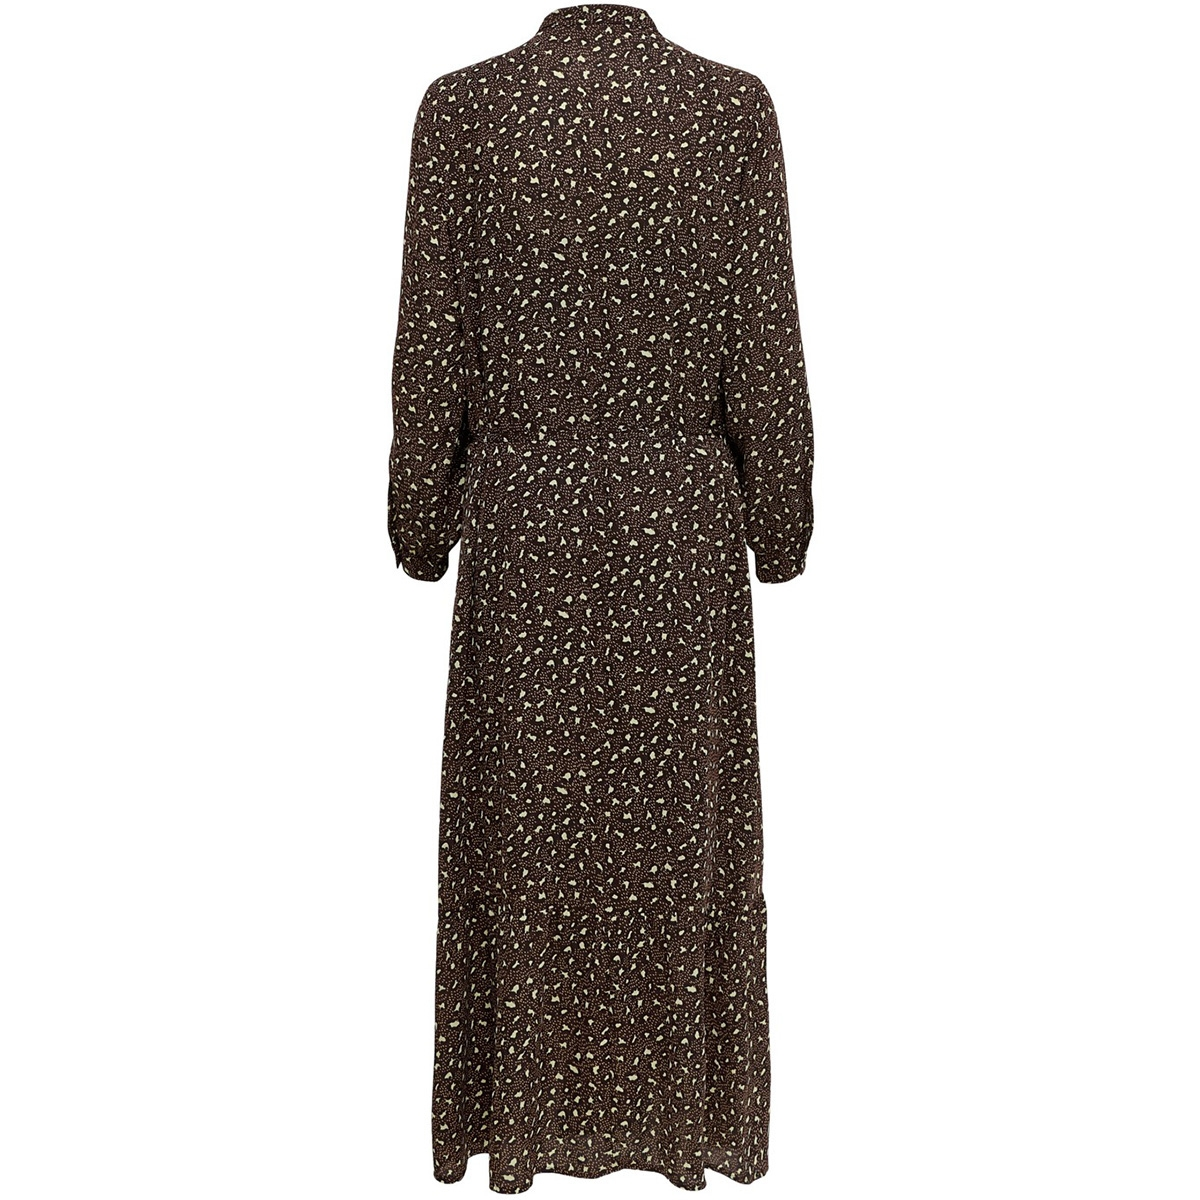 jdyricci l/s maxi dress wvn 35005787 jacqueline de yong jurk chicory coffee/leo